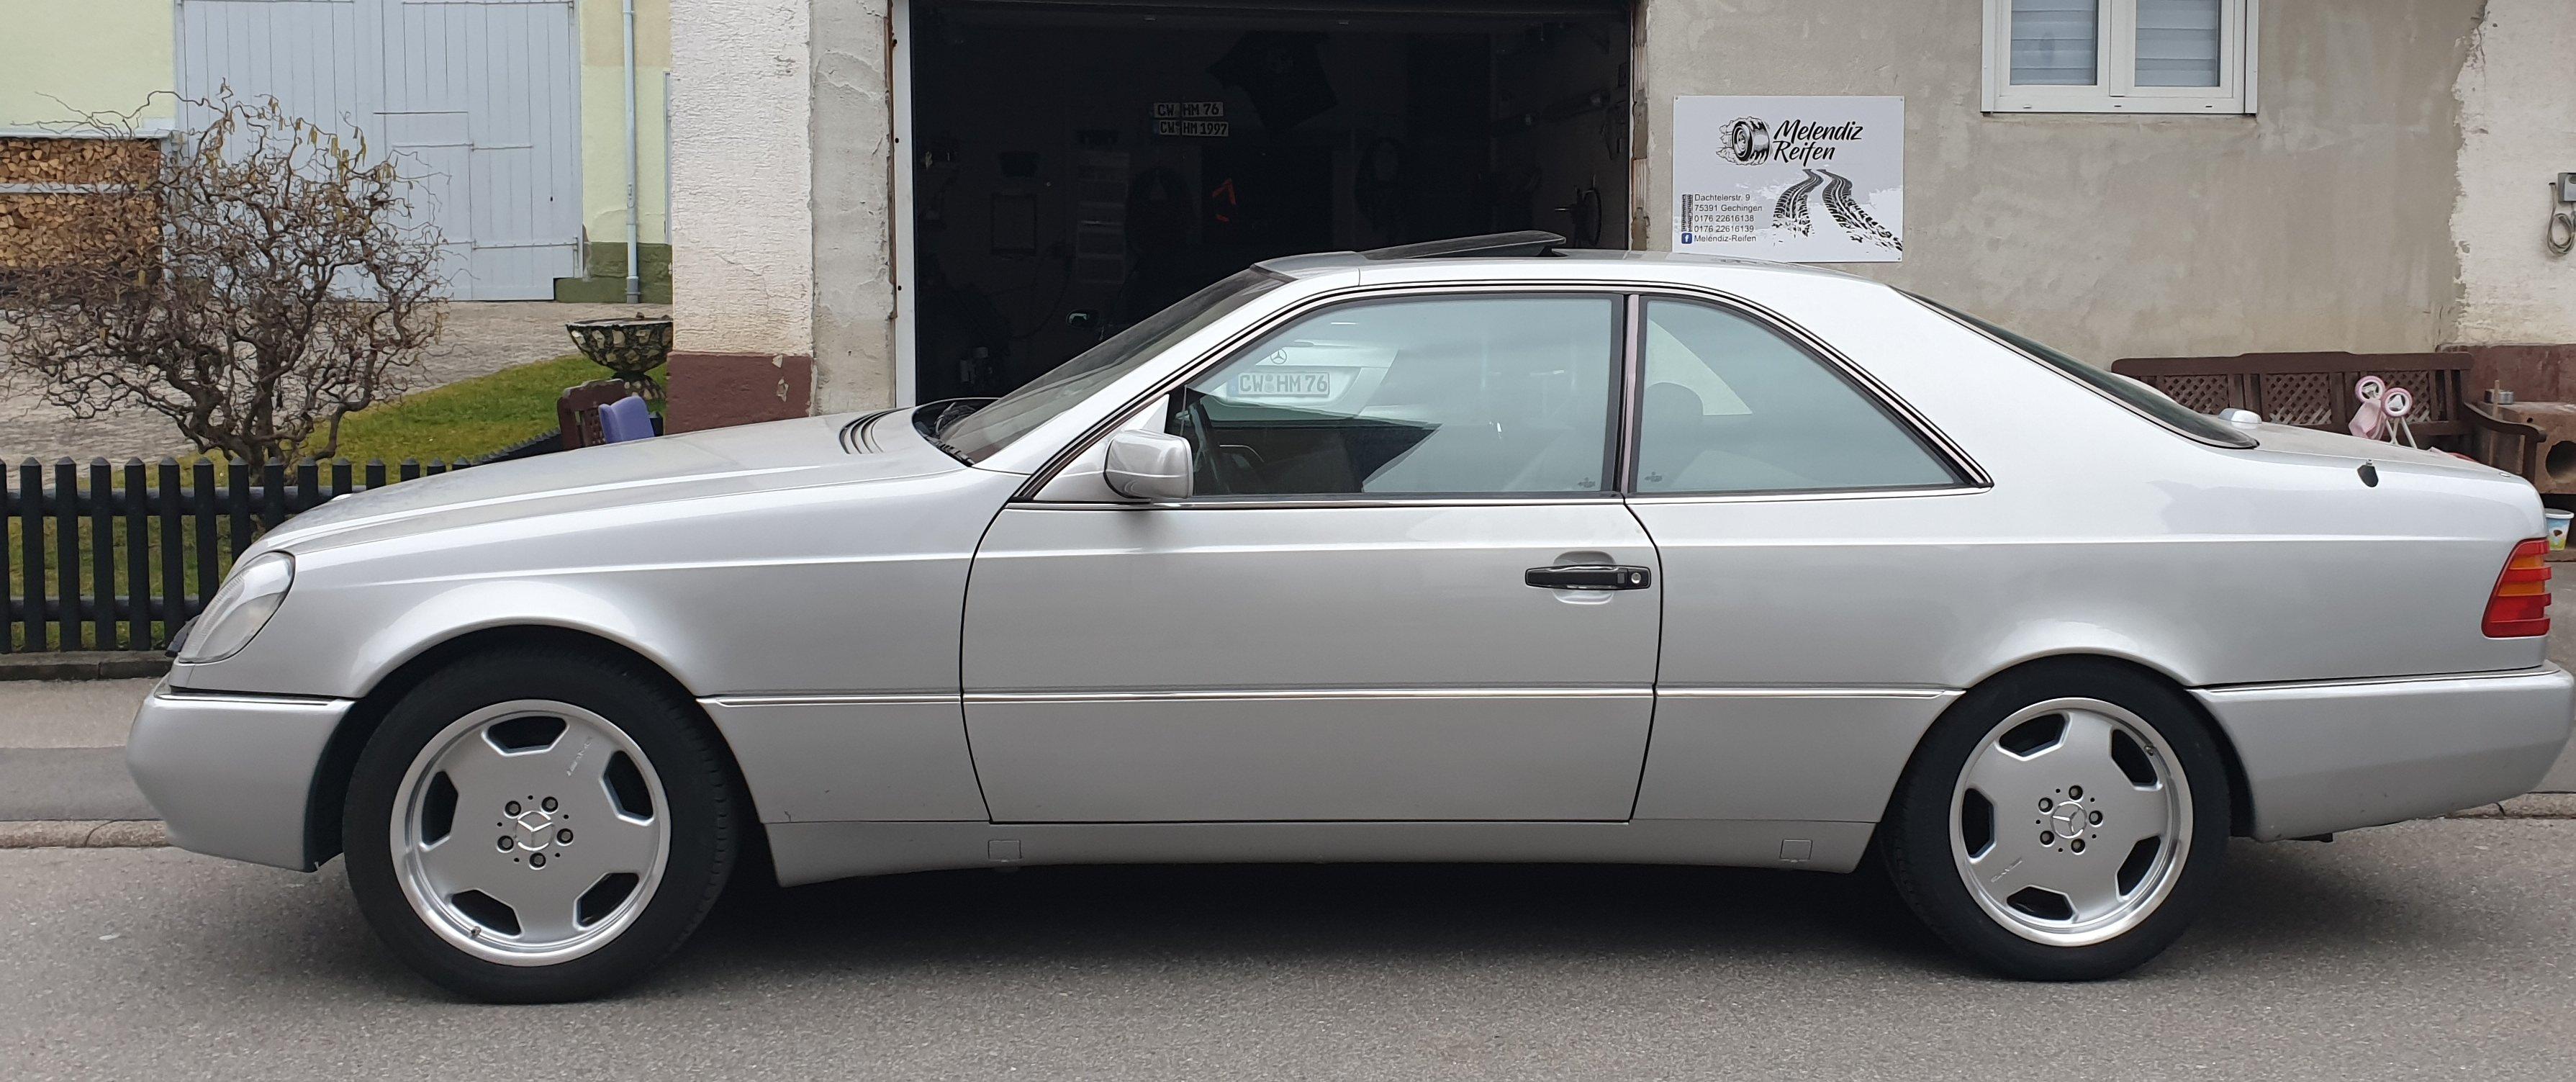 Mercedes-Benz – CL-Klasse – AMG – Styling 2 – Silber – 18 Zoll